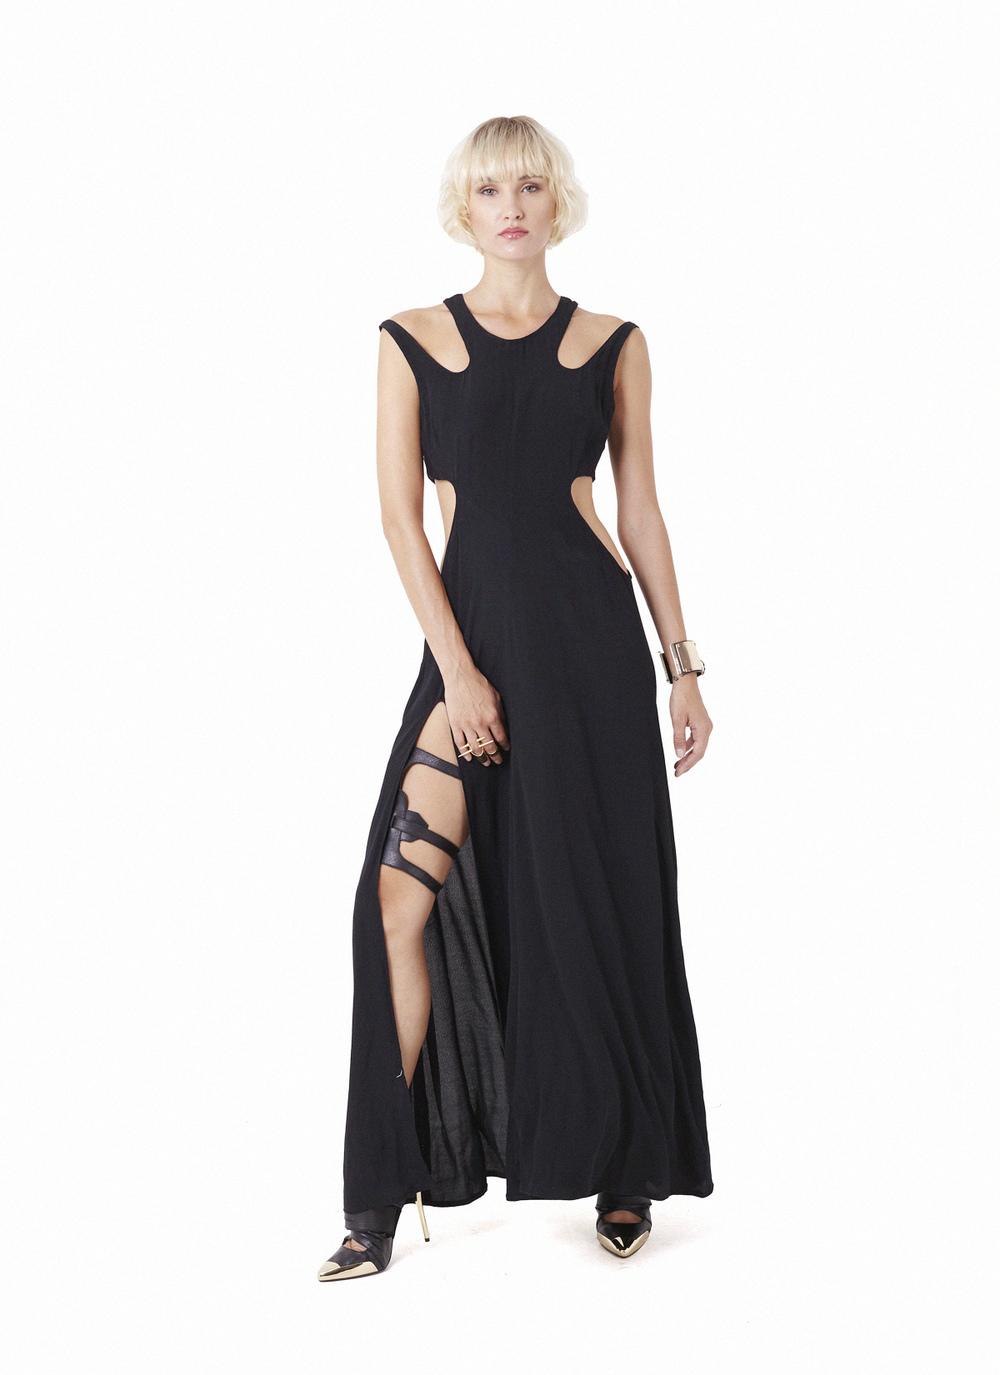 Falline dress & Spar Legpiece